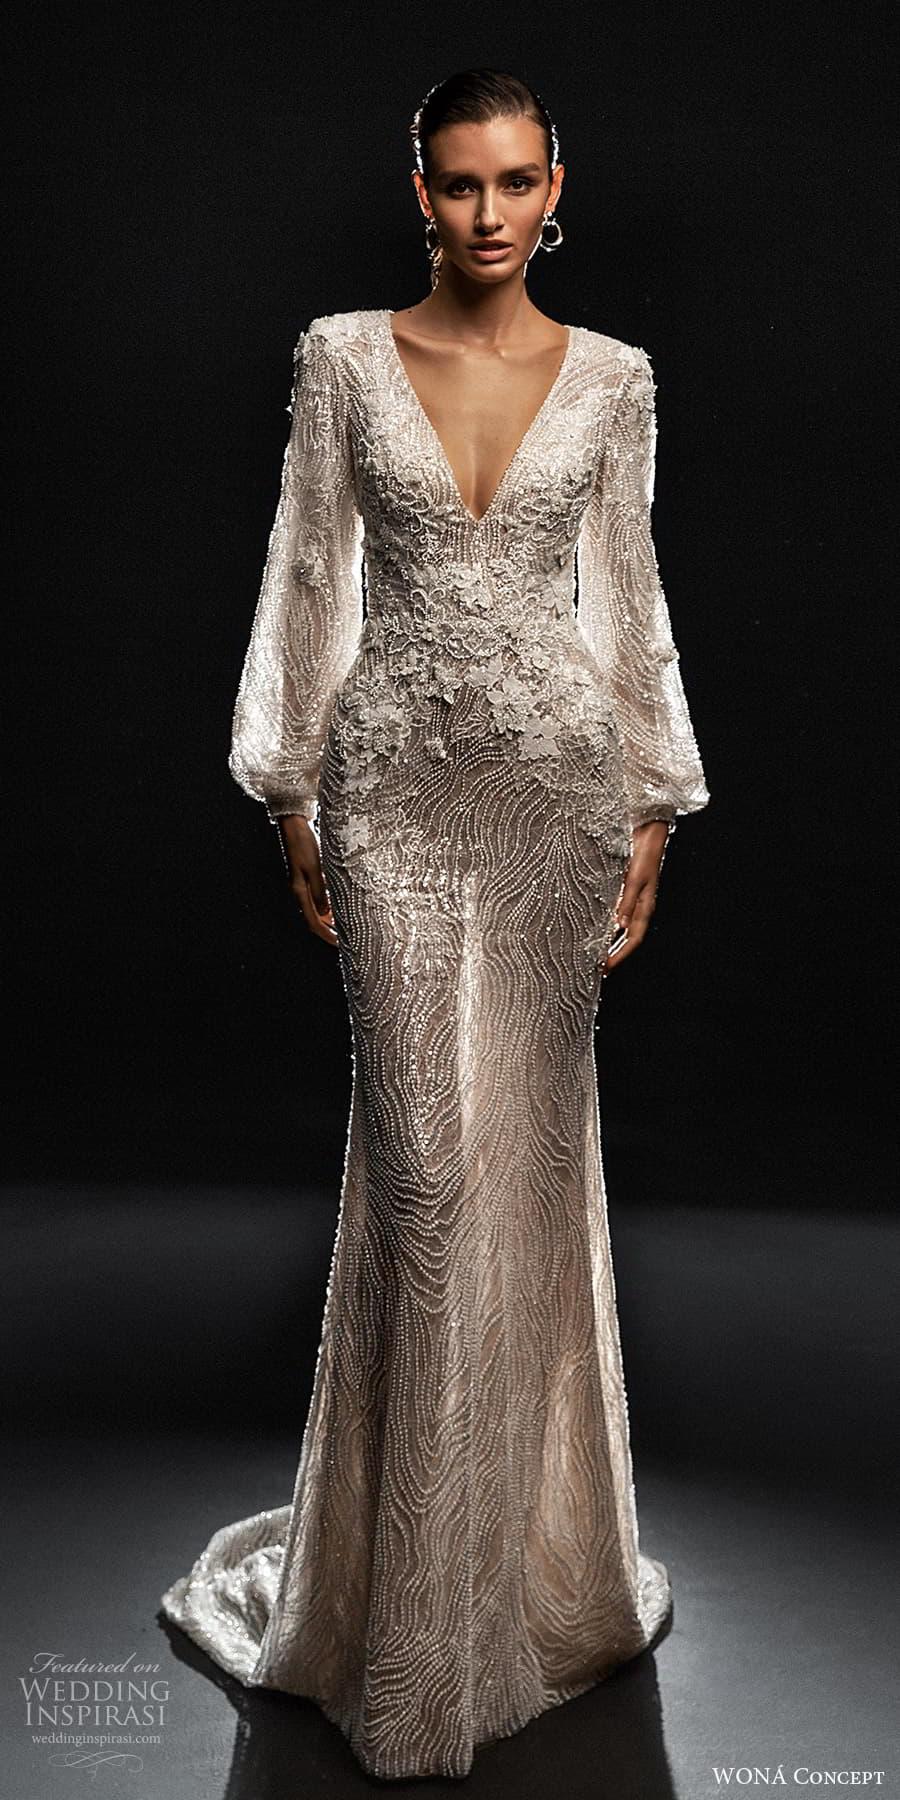 wona concept 2022 bridal bishop sleeves v necklne fully embellished sheath wedding dress (26) mv